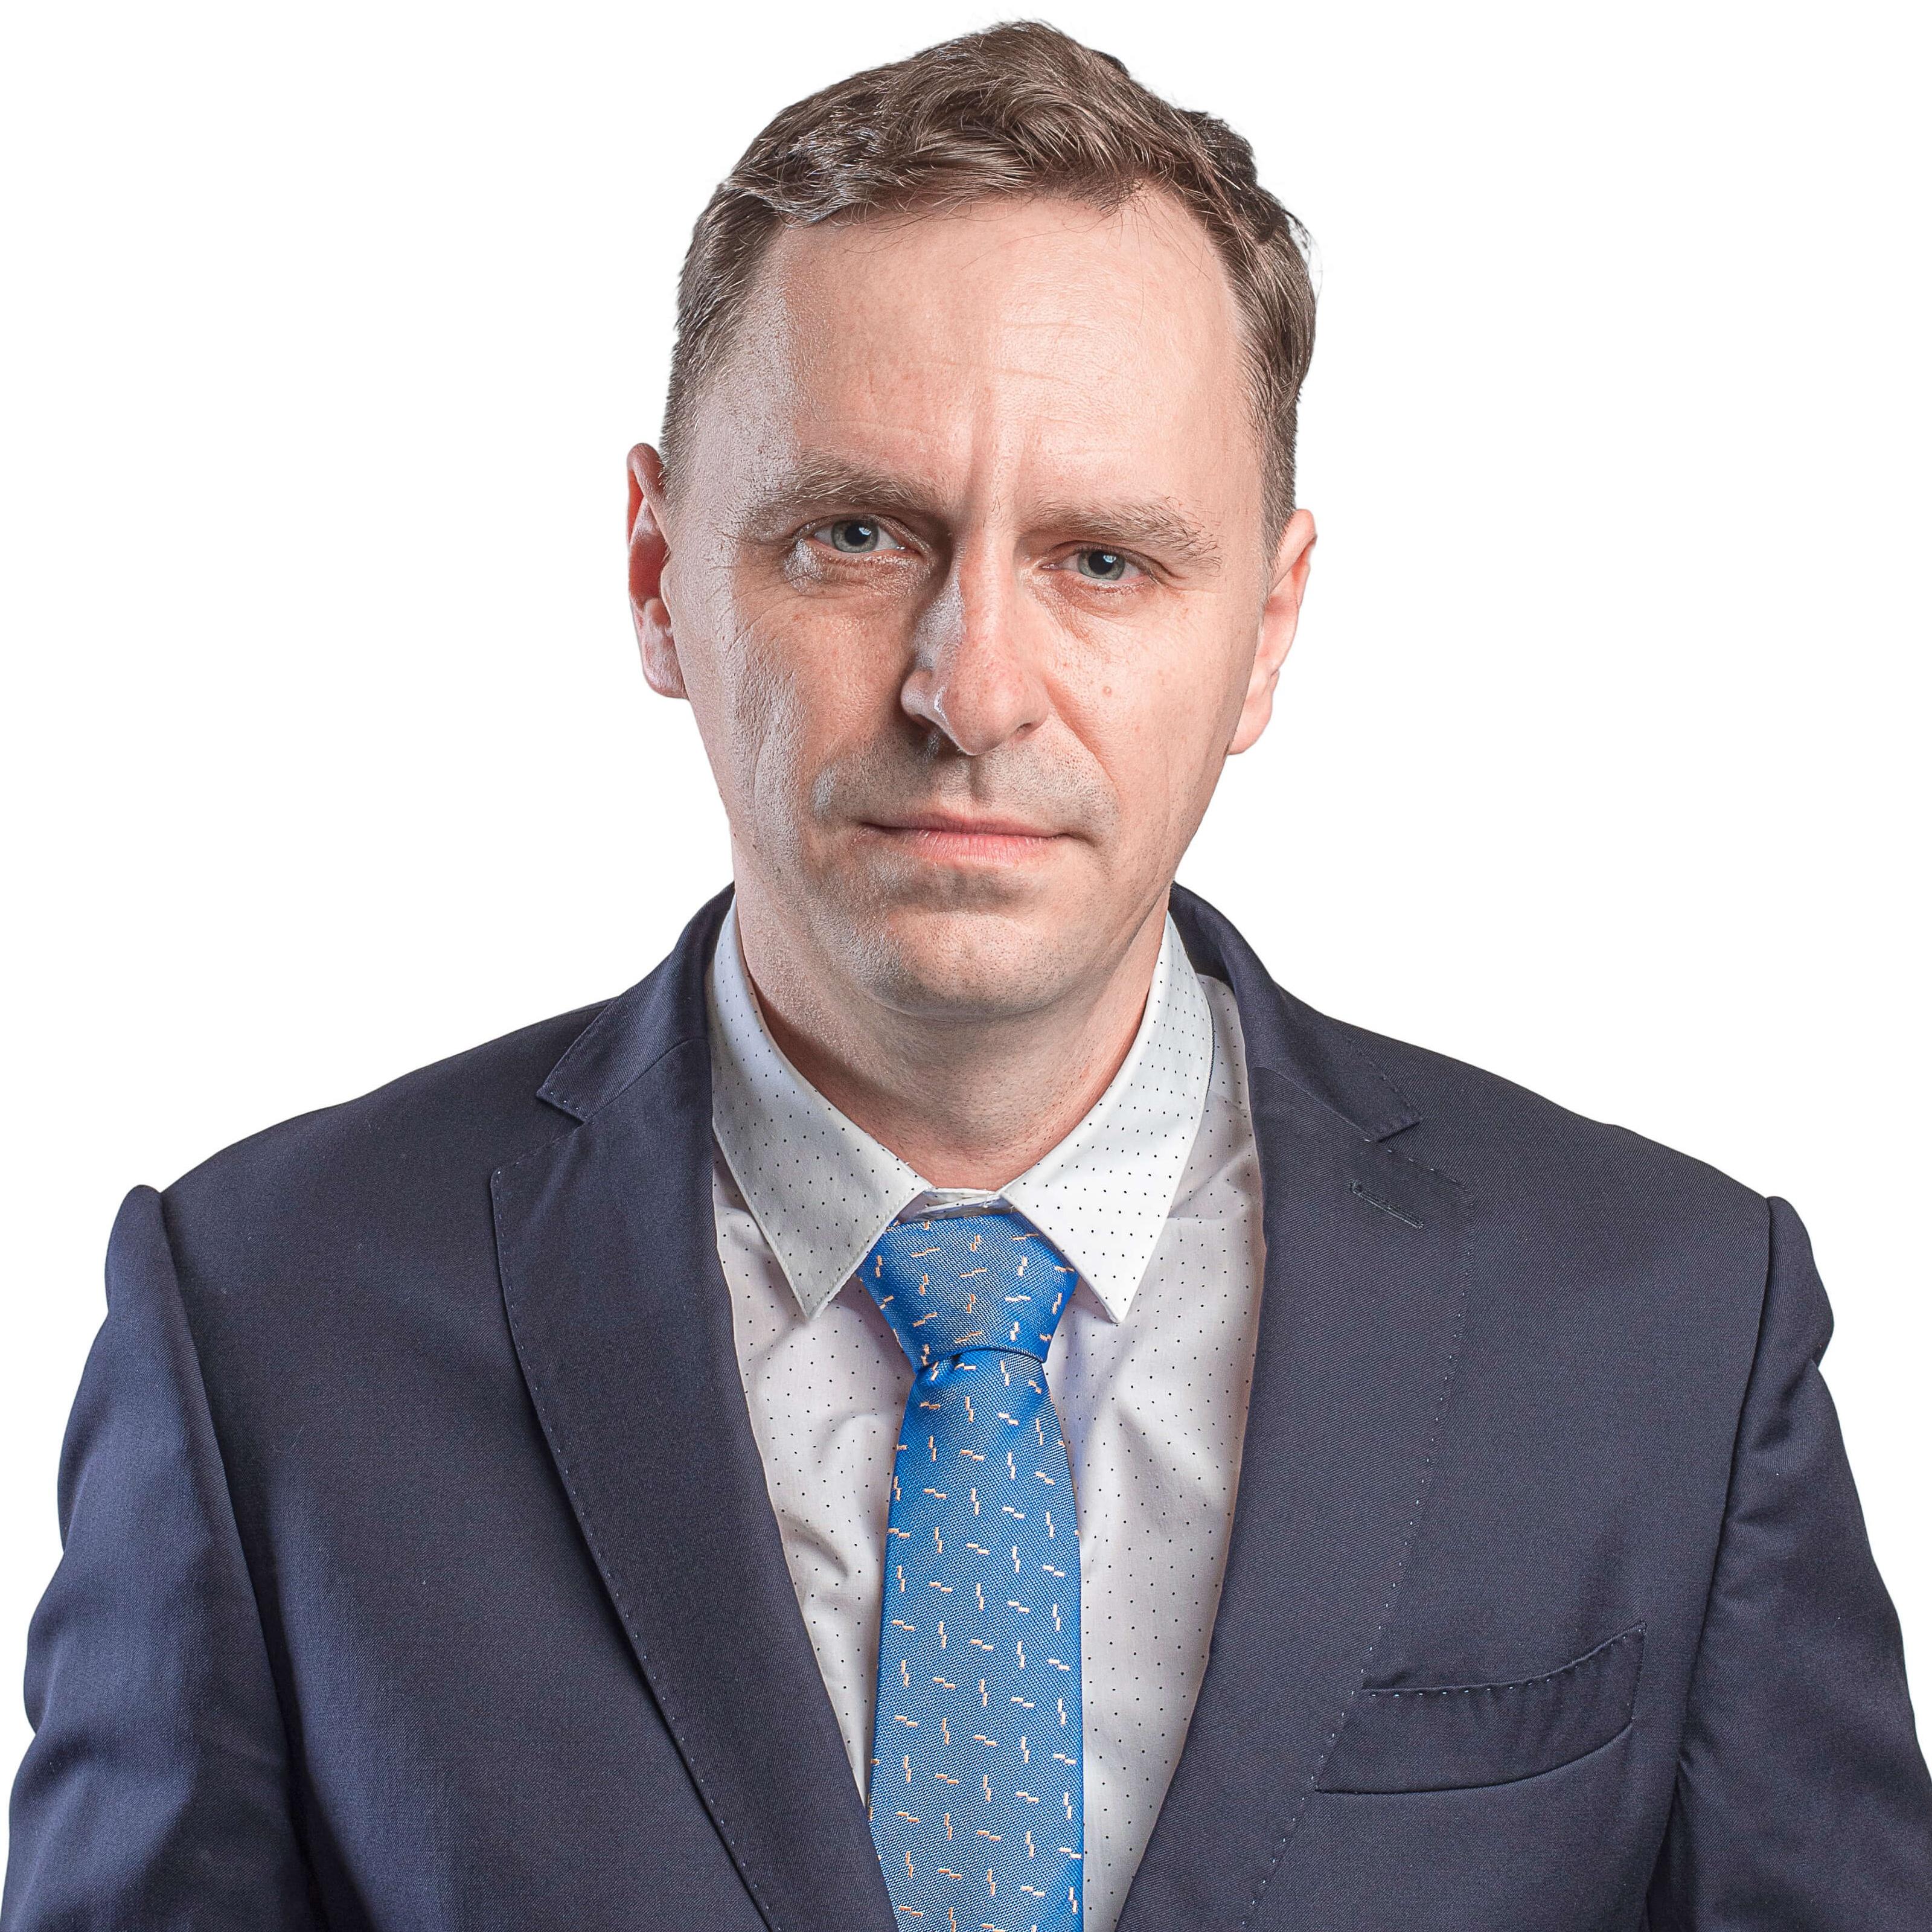 Radu-Iulian Molnar